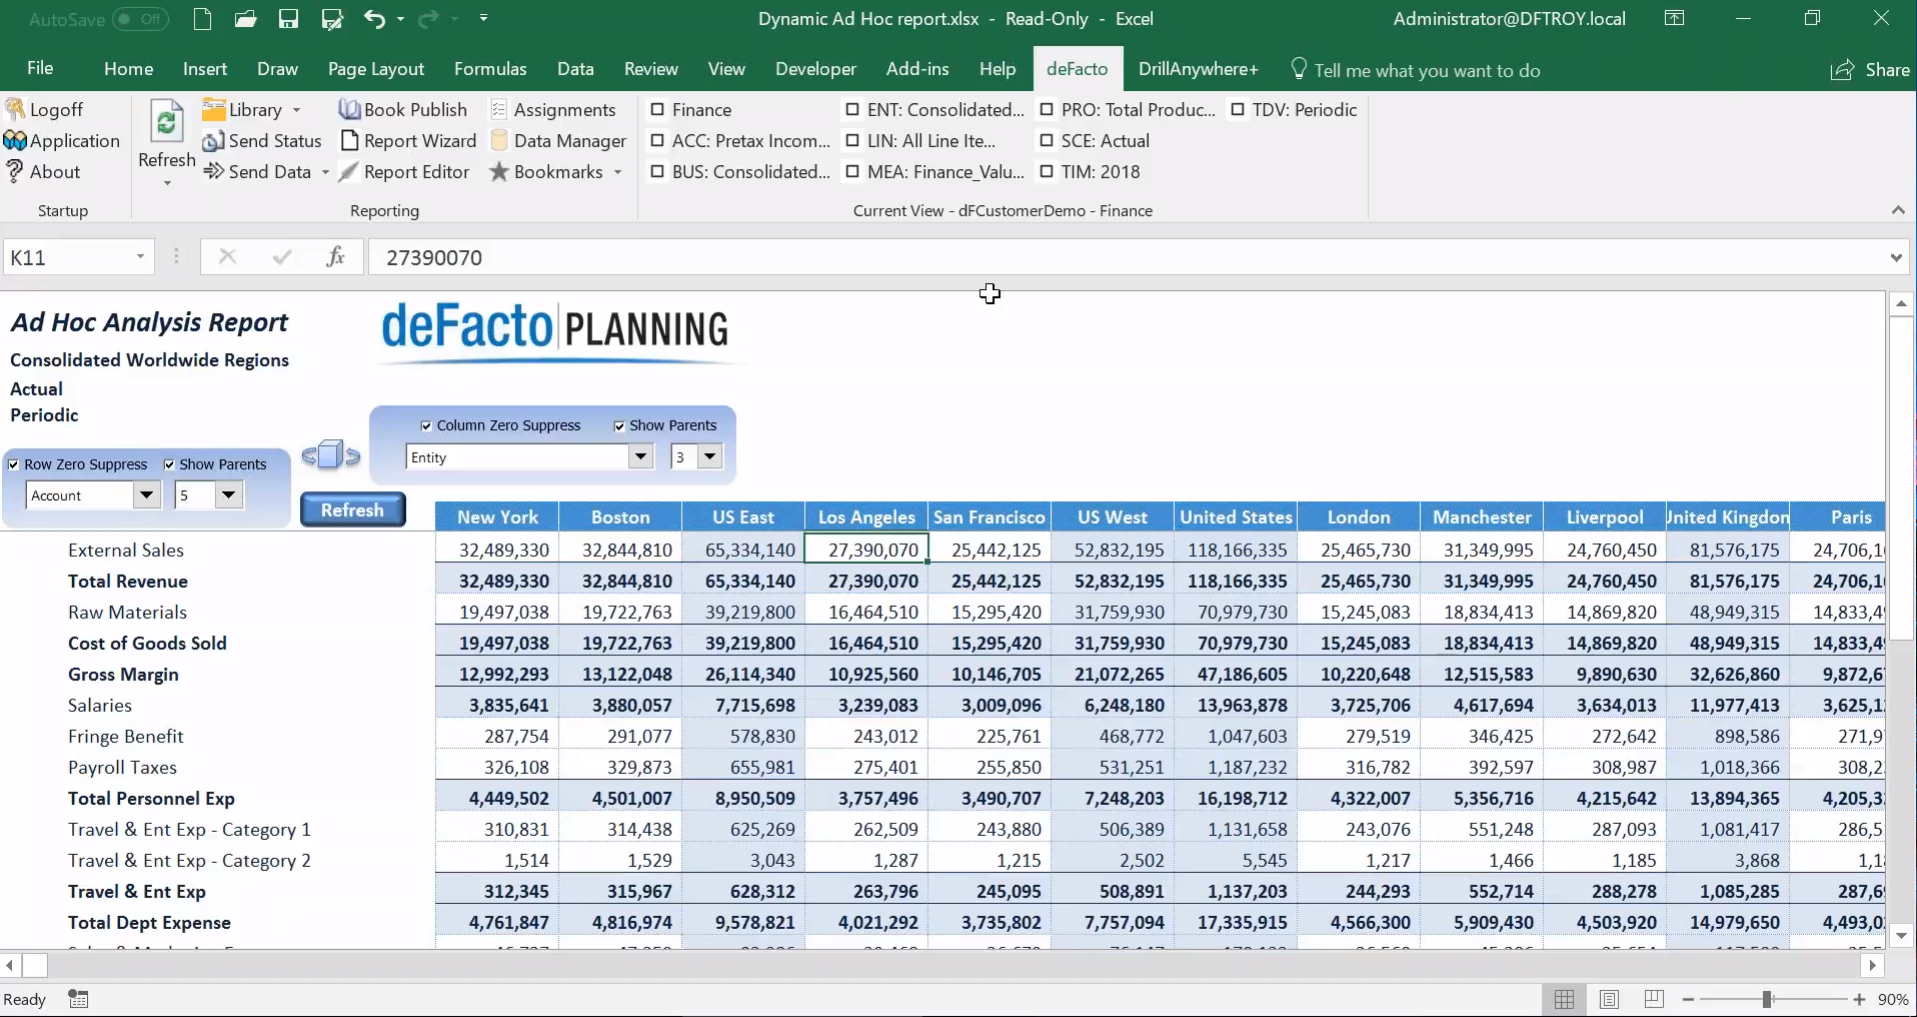 deFacto Planning Demo - Adhoc Report Analysis